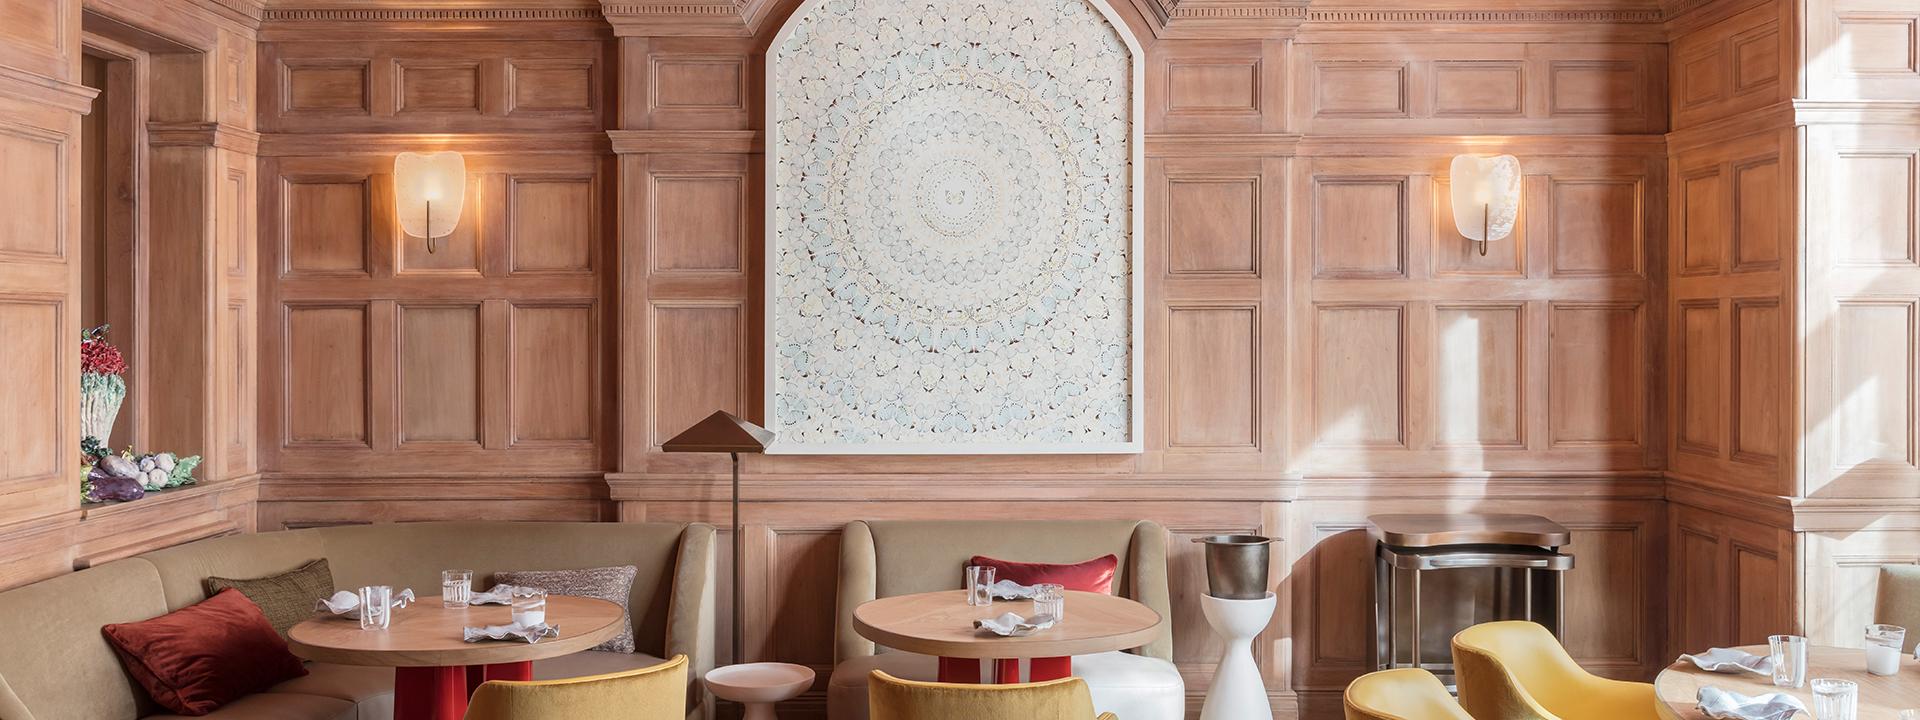 Interior of Hélène Darroze restaurant at The Connaught in Mayfair